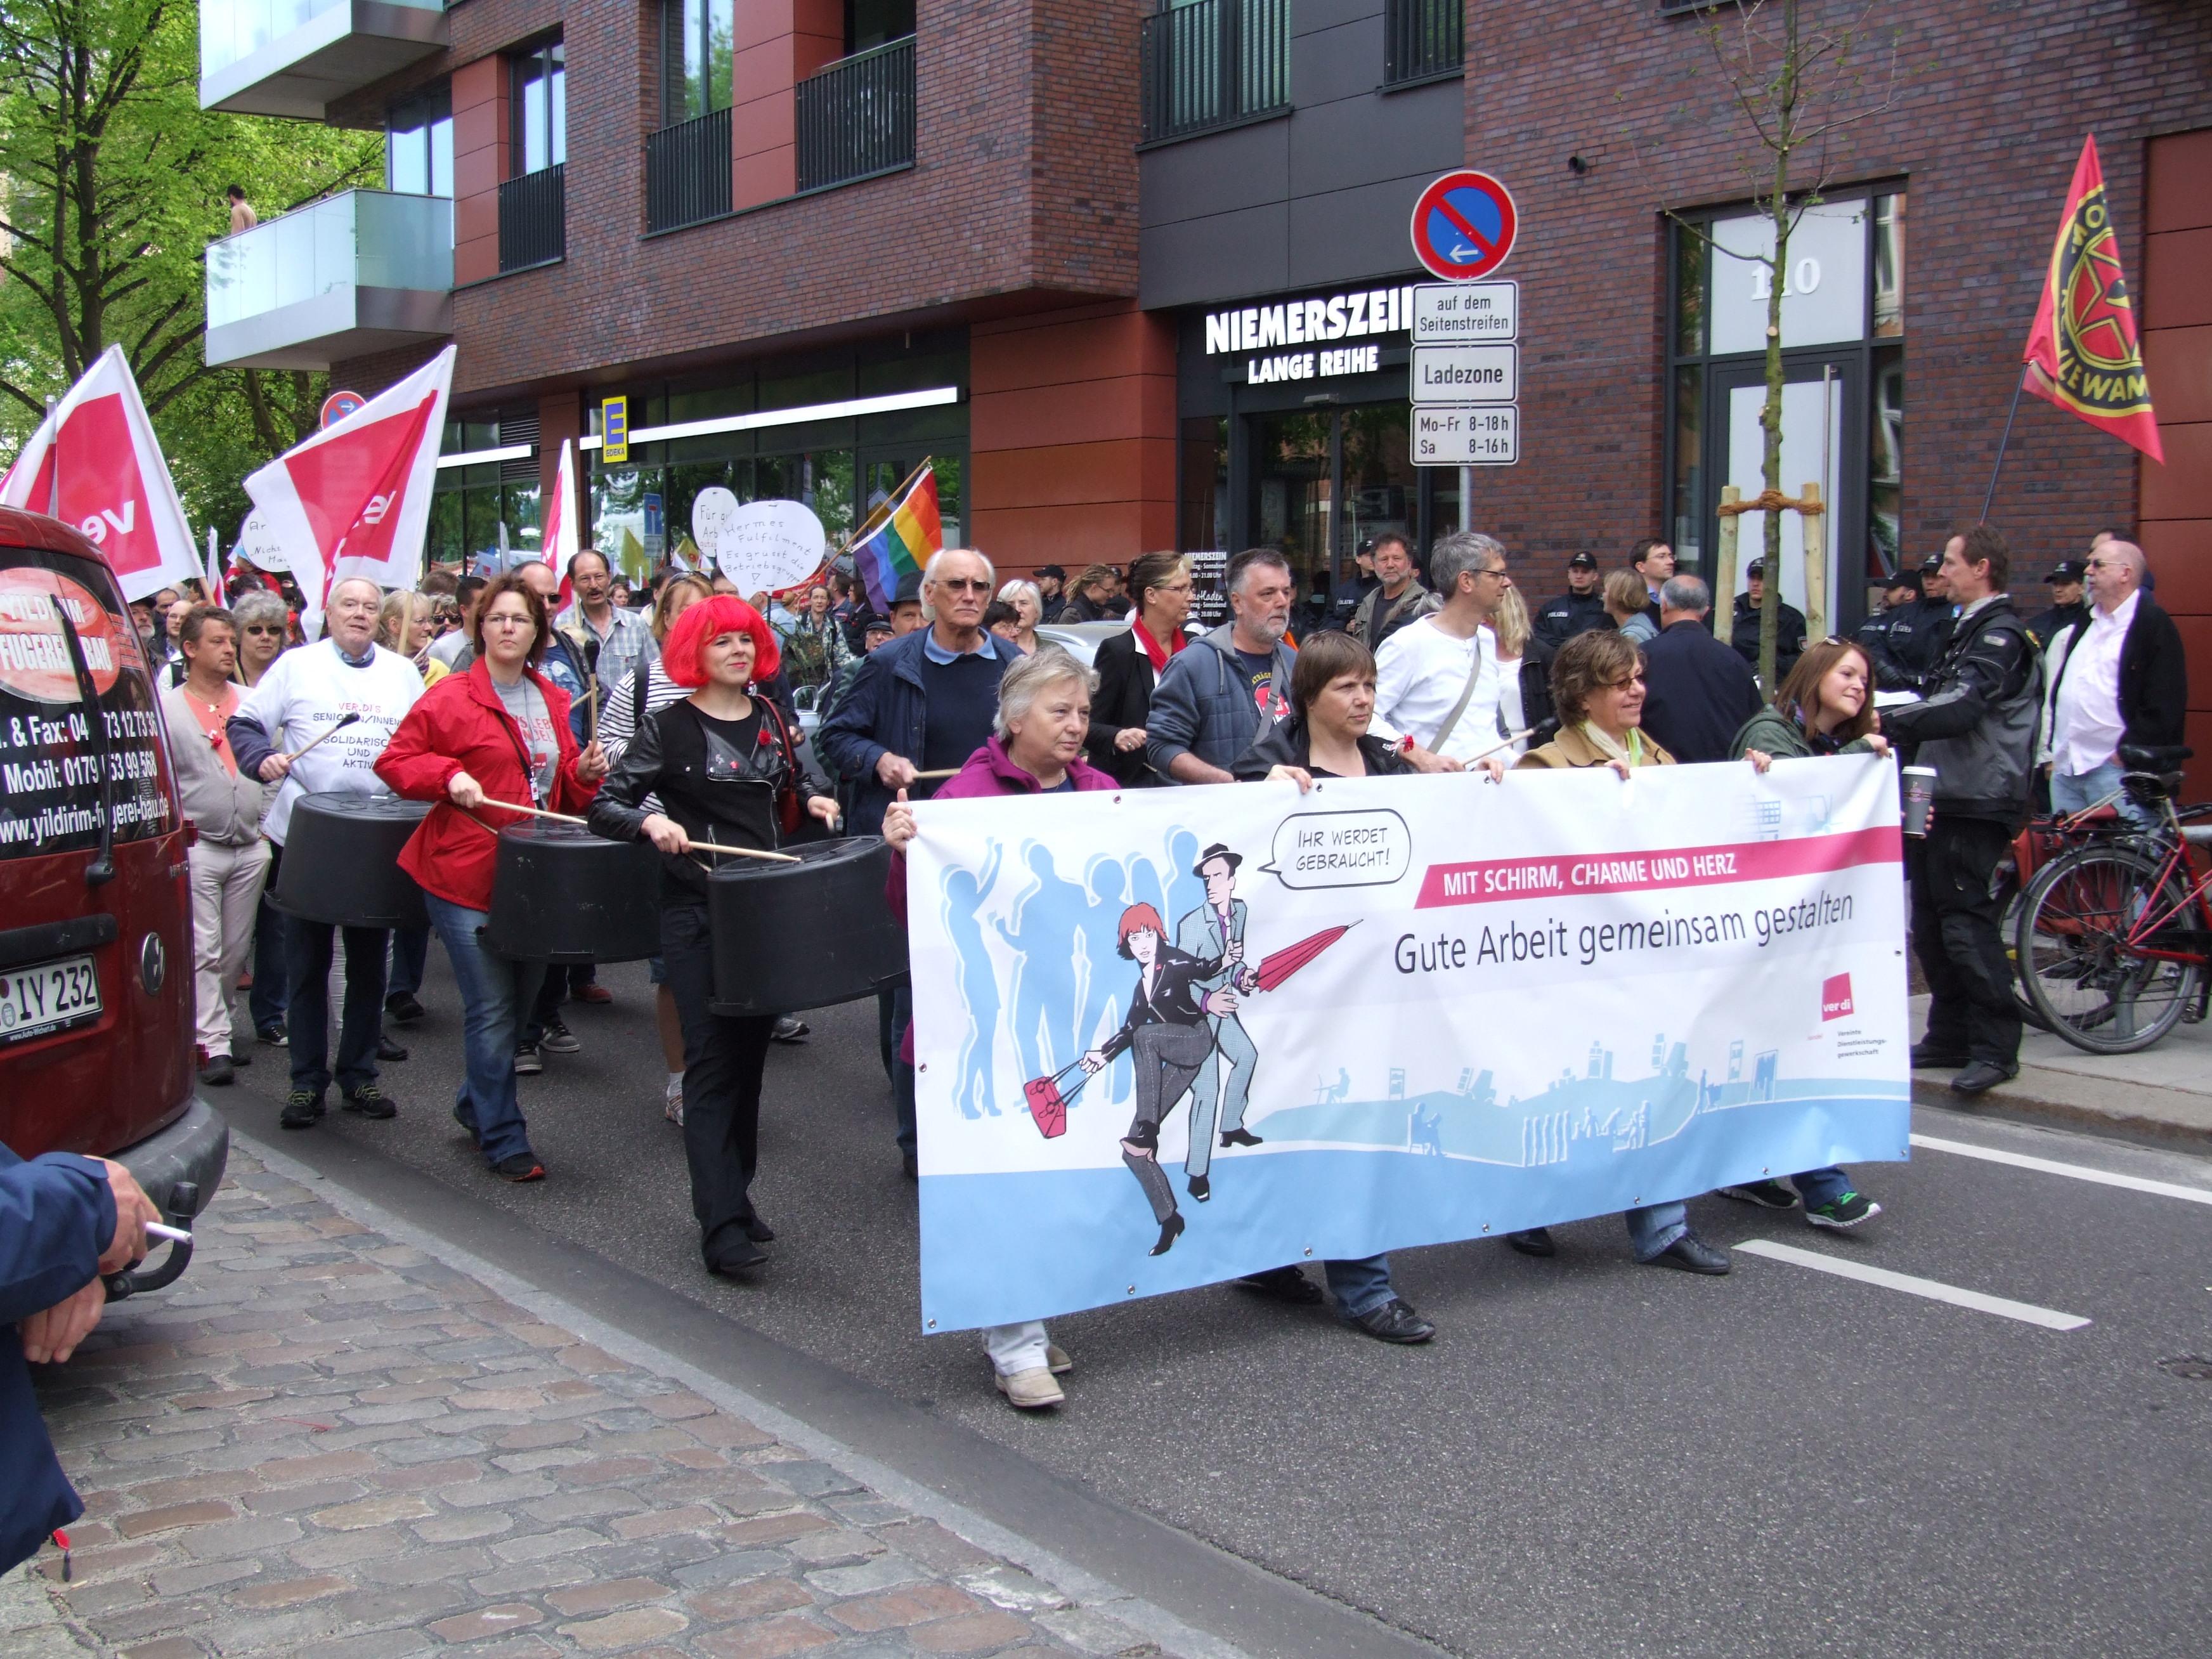 File:1 - Hamburg 1. Mai 2014 01.JPG - Wikimedia Commons